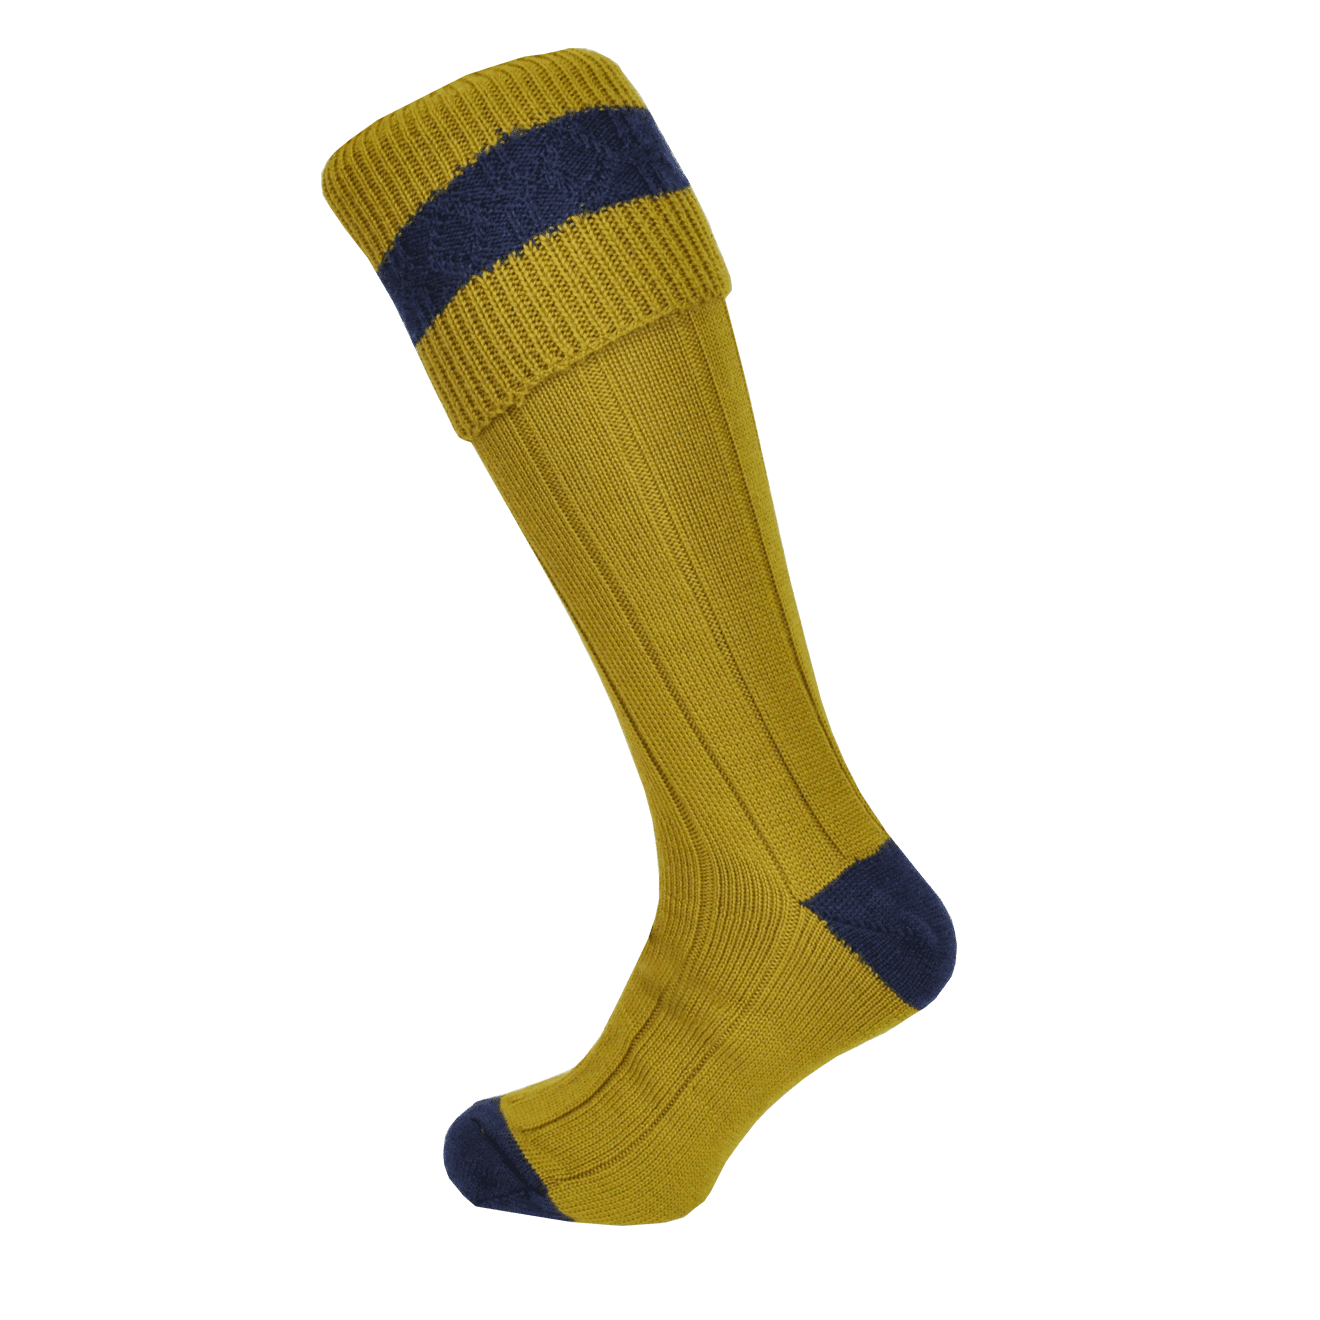 Macfarlaine Contrast Shooting Socks Antique Gold / Navy